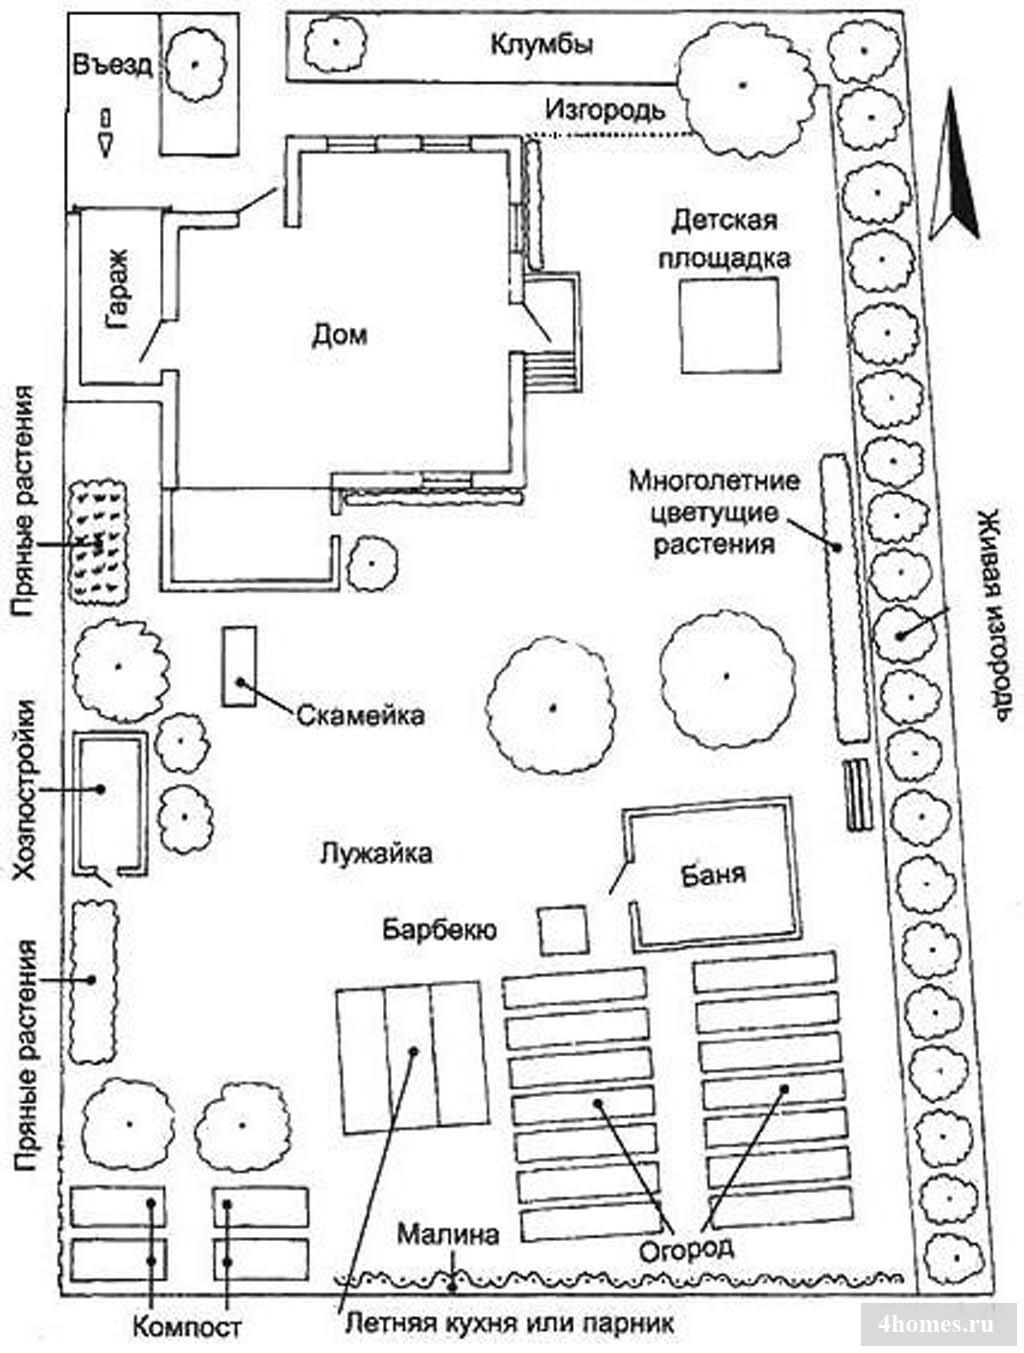 План участка загородного дома 15 соток схема